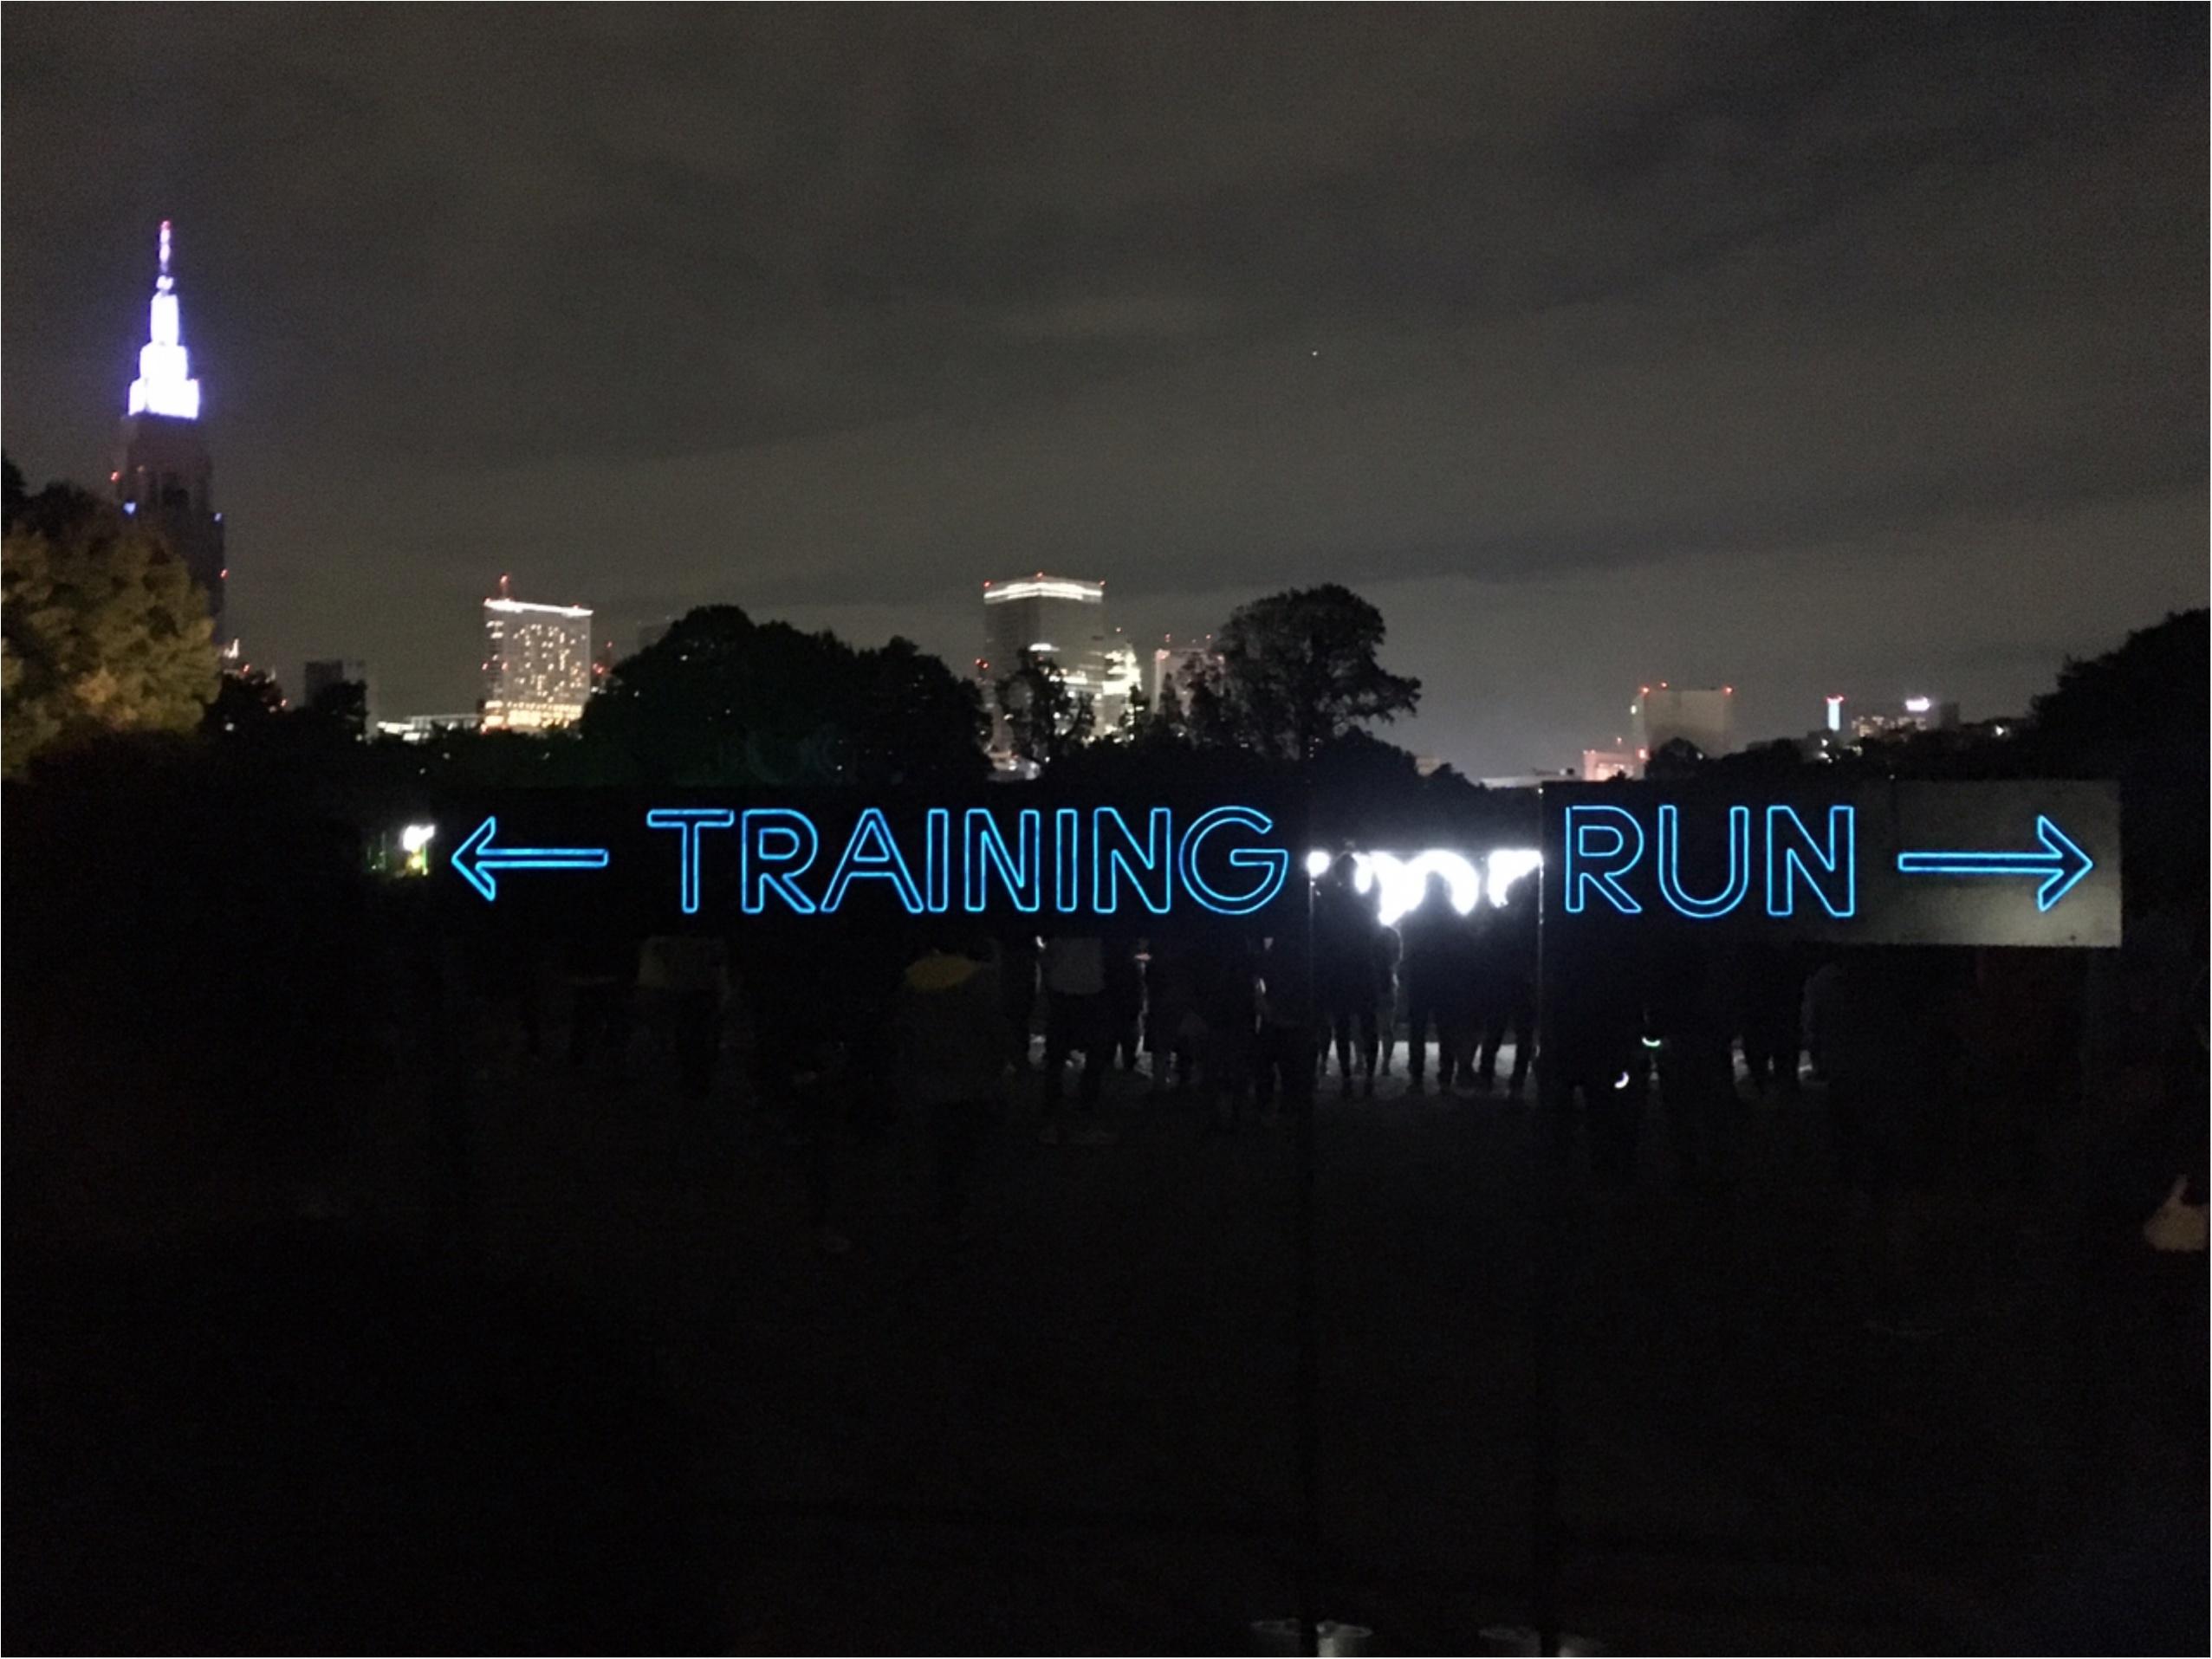 【NIKE(ナイキ)】『AFTER DARK』夜の新宿御苑でラン&トレーニング!_3